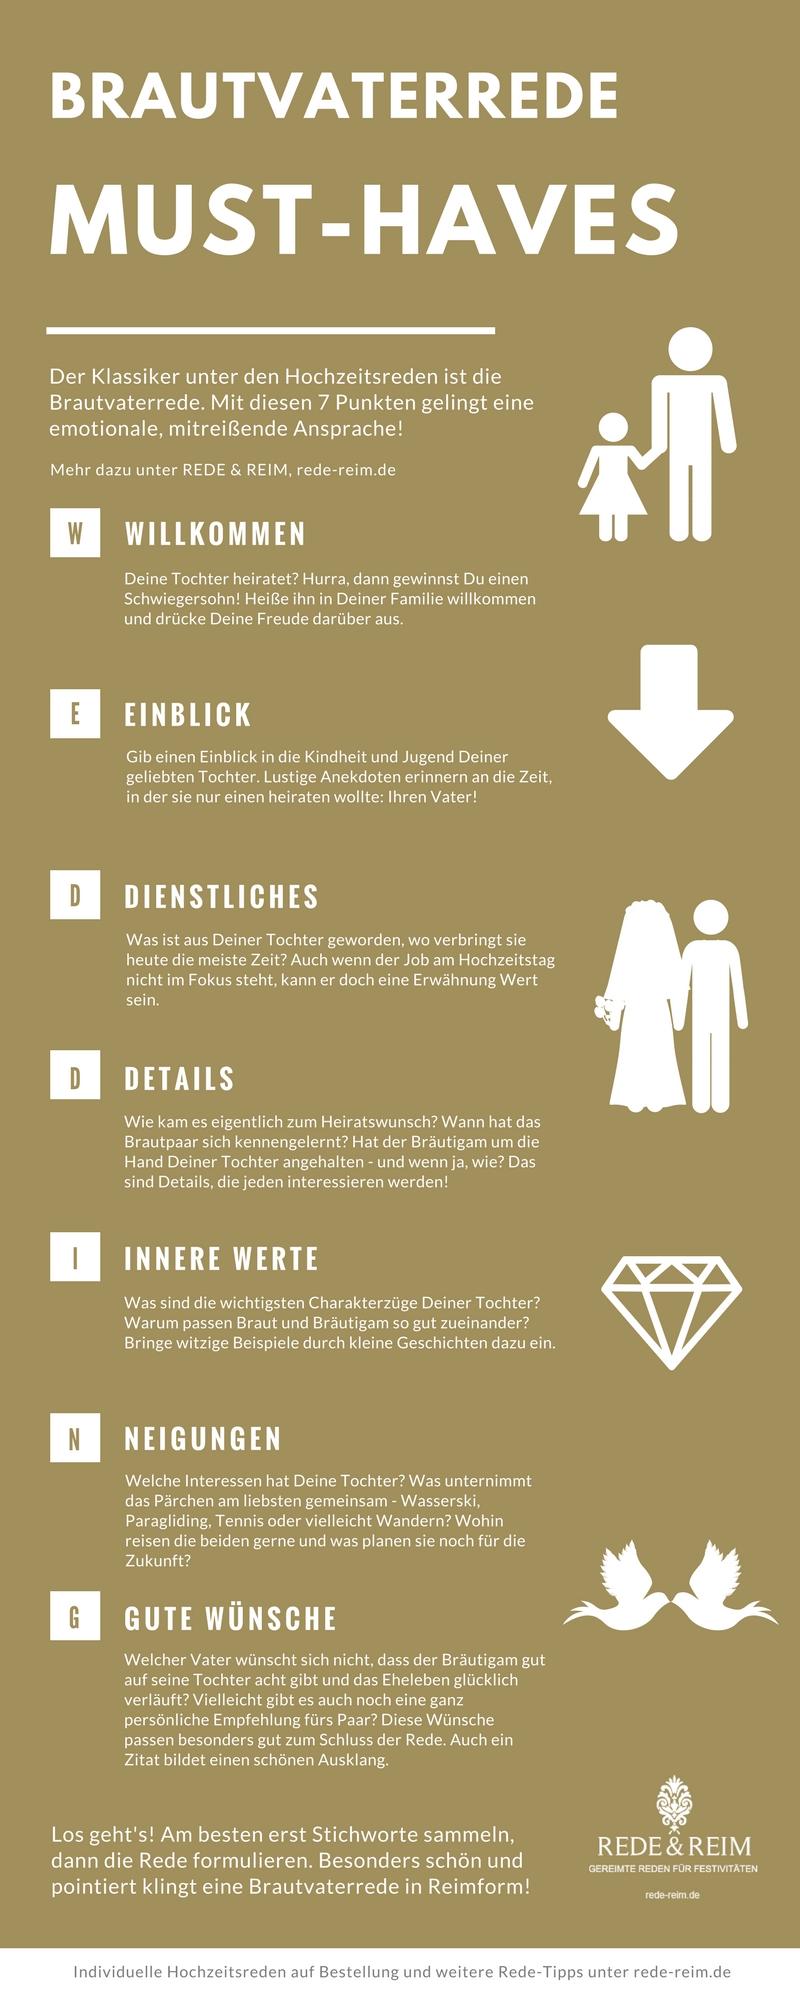 Brautvaterrede Guideline